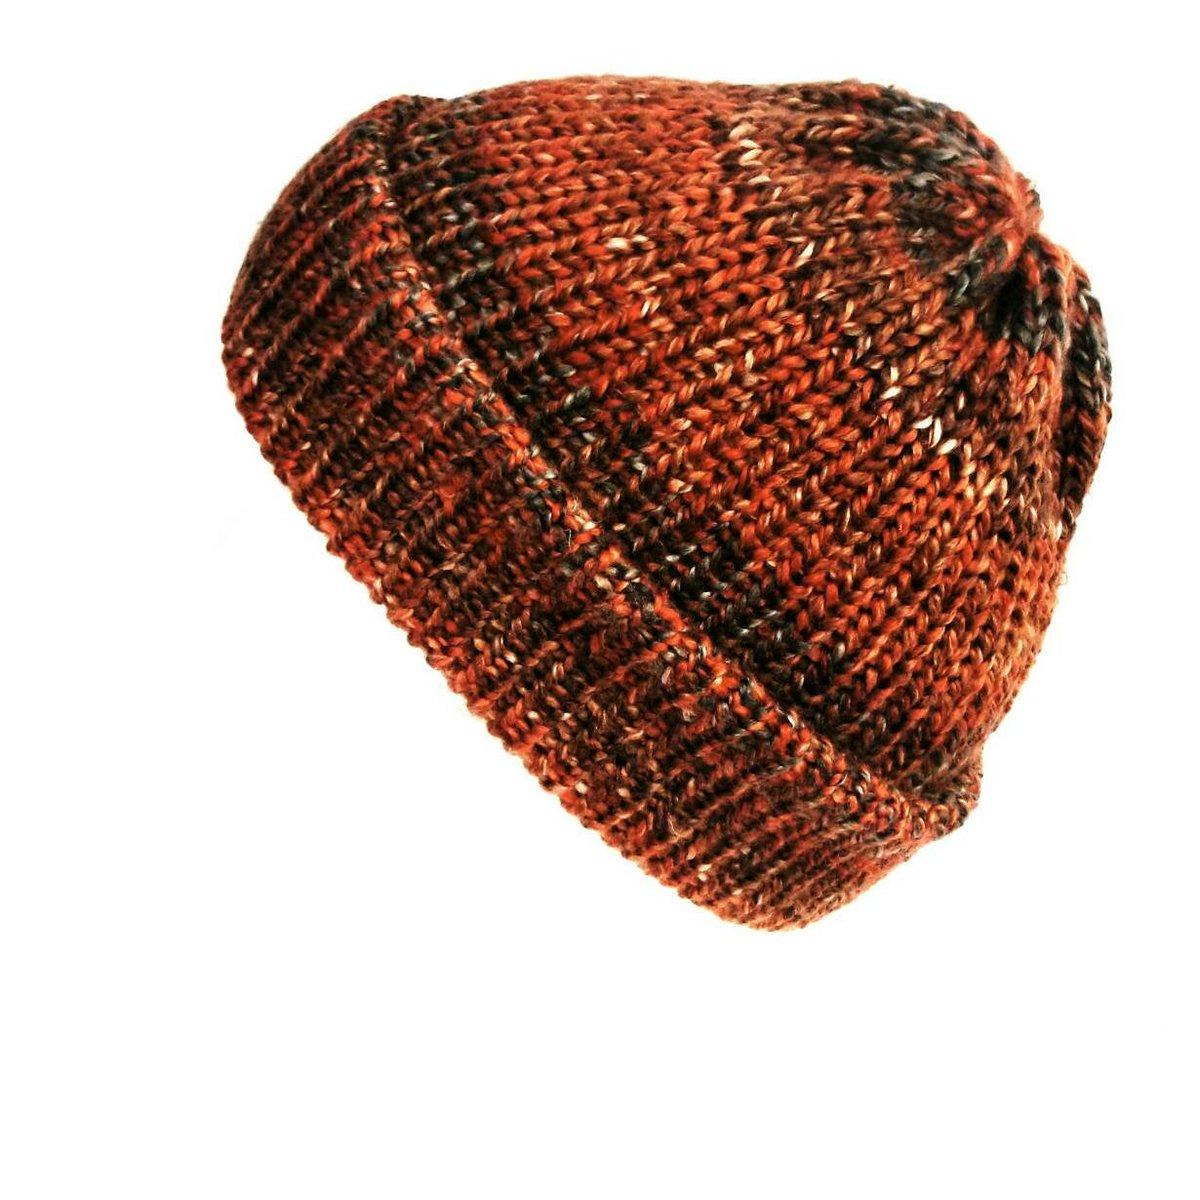 Burnt orange beanie, trawler beanie, cuffed beanie hat, soft vegan wool hat, knit skull beanie, winter hat for women, one size fits all https://etsy.me/2JDcl8d #Handmadehour #Veganfashion #Etsy #Vegan #Shopping #Knittedhats #Grunge #FishermanBeanieHatpic.twitter.com/Zh6HWcR3FD